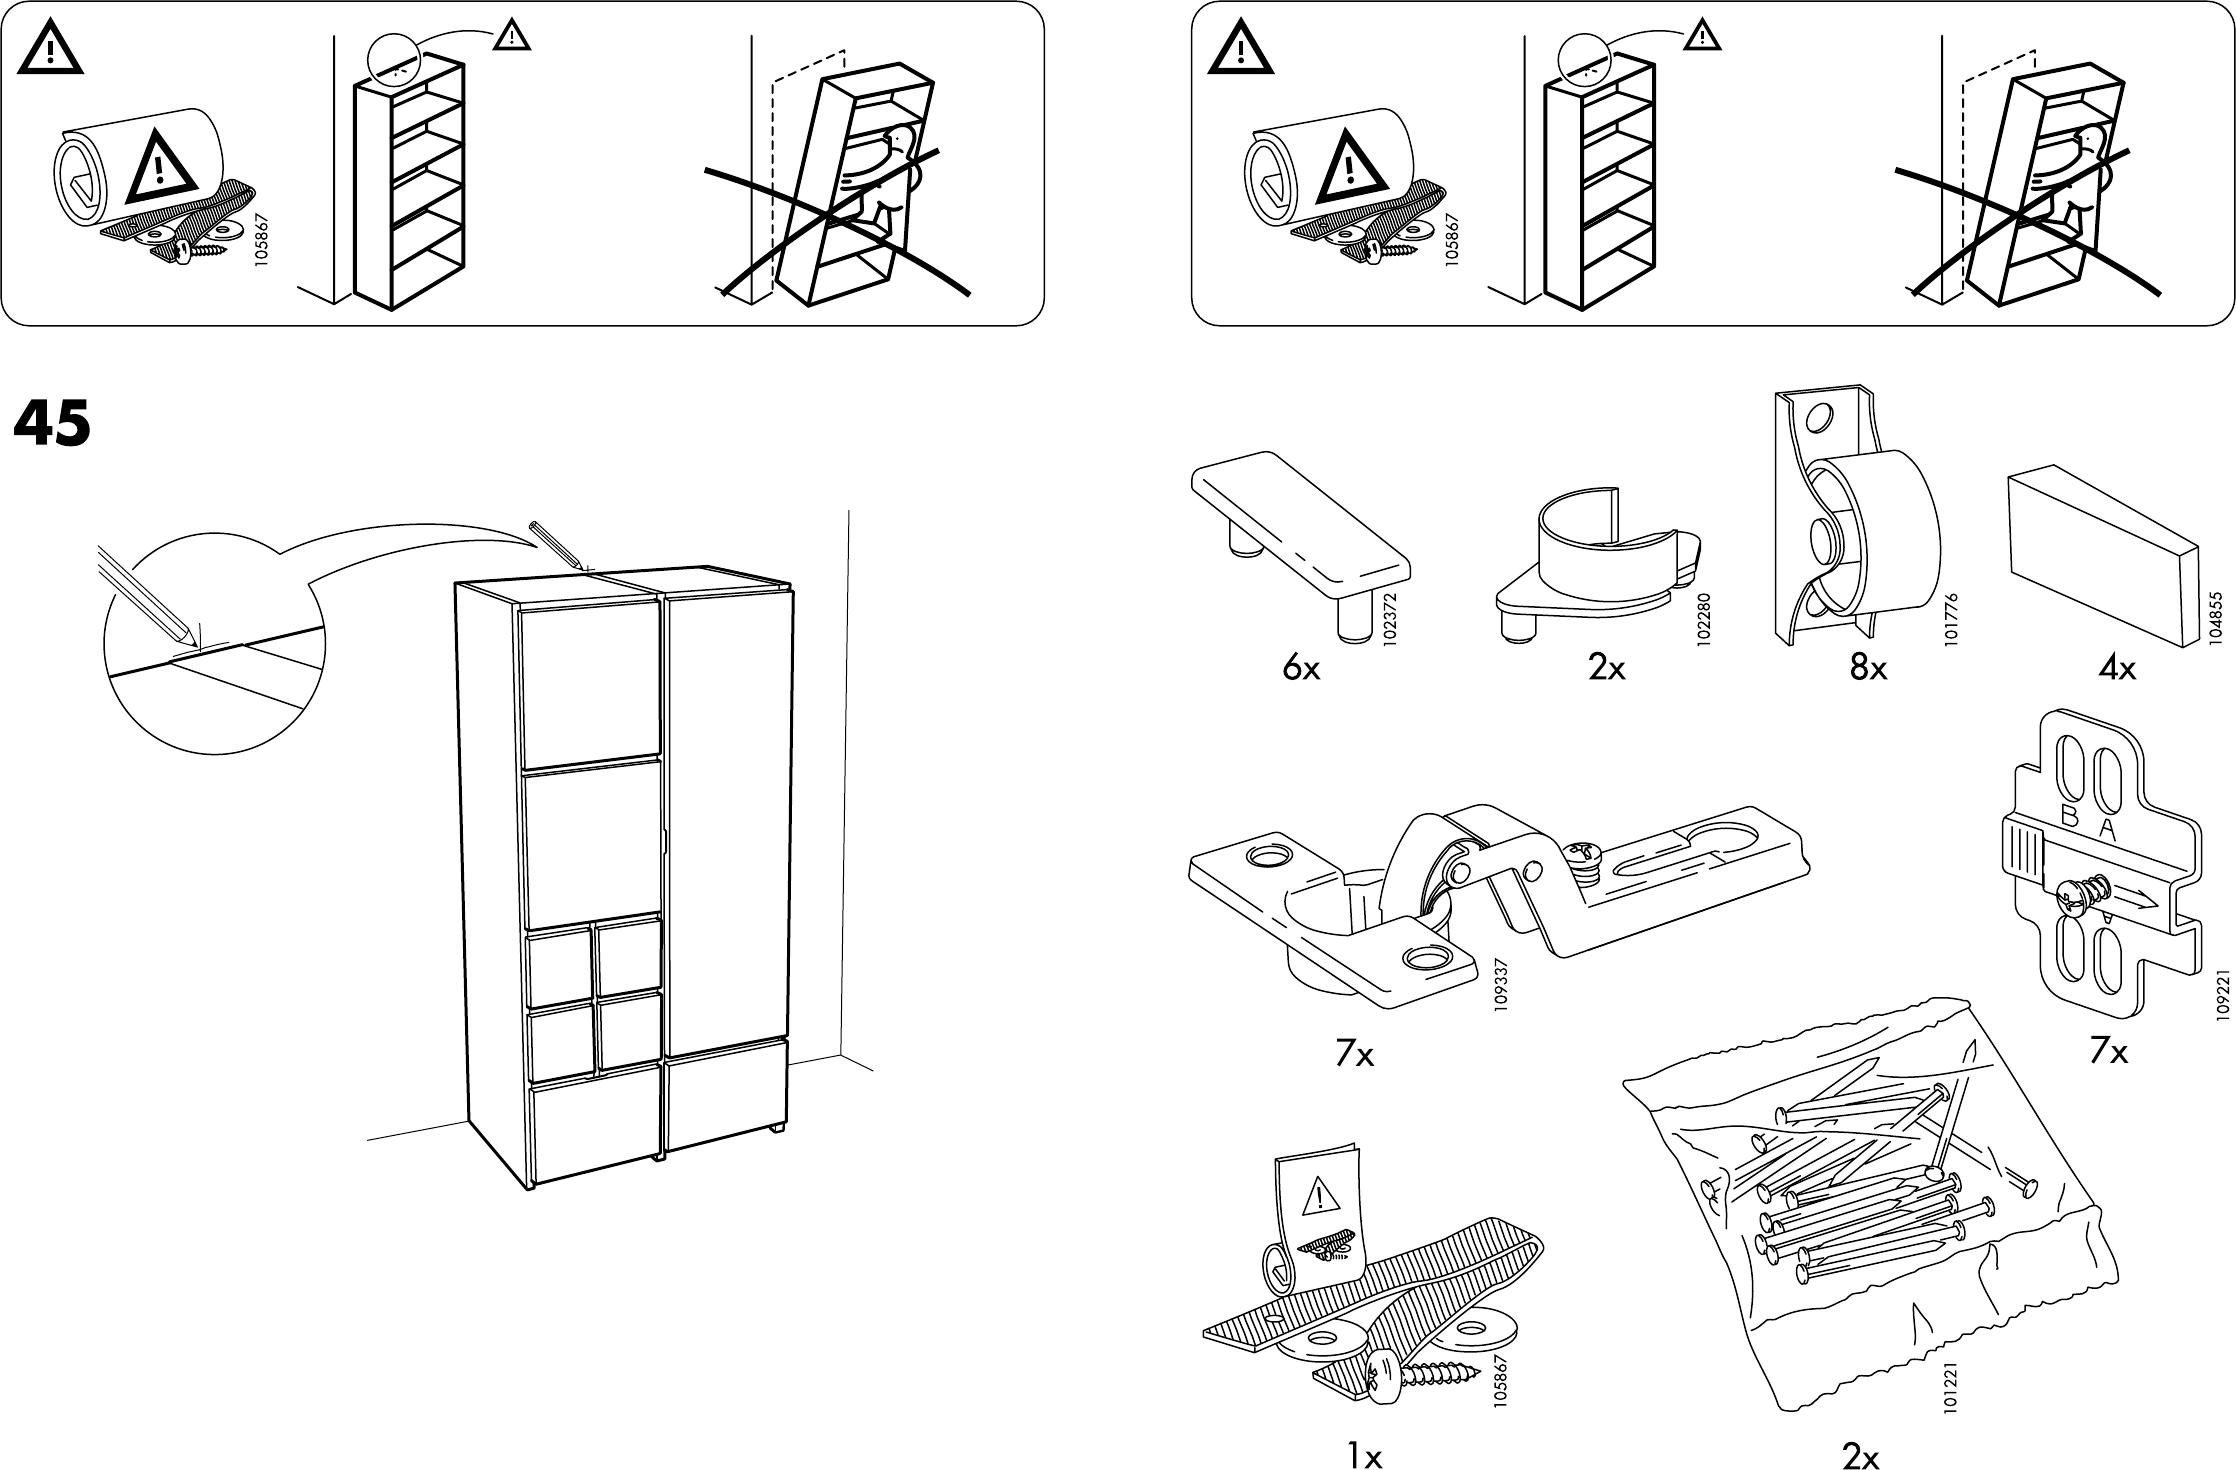 Ikea Ideas For Small Living Room ~ Handleiding Ikea Rakke kast (pagina 3 van 12) (Dansk, Deutsch, English